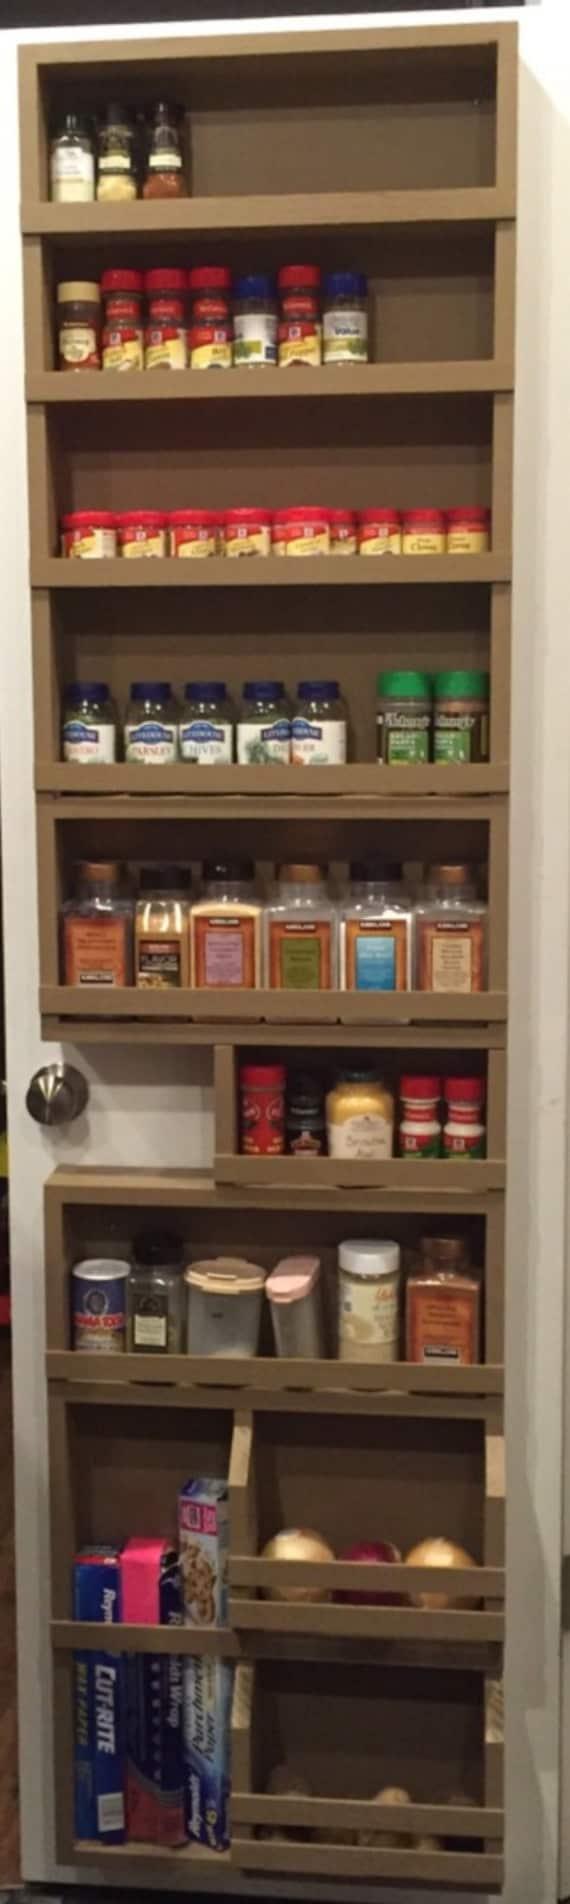 full door pantry spice rack by waynestruction on etsy. Black Bedroom Furniture Sets. Home Design Ideas